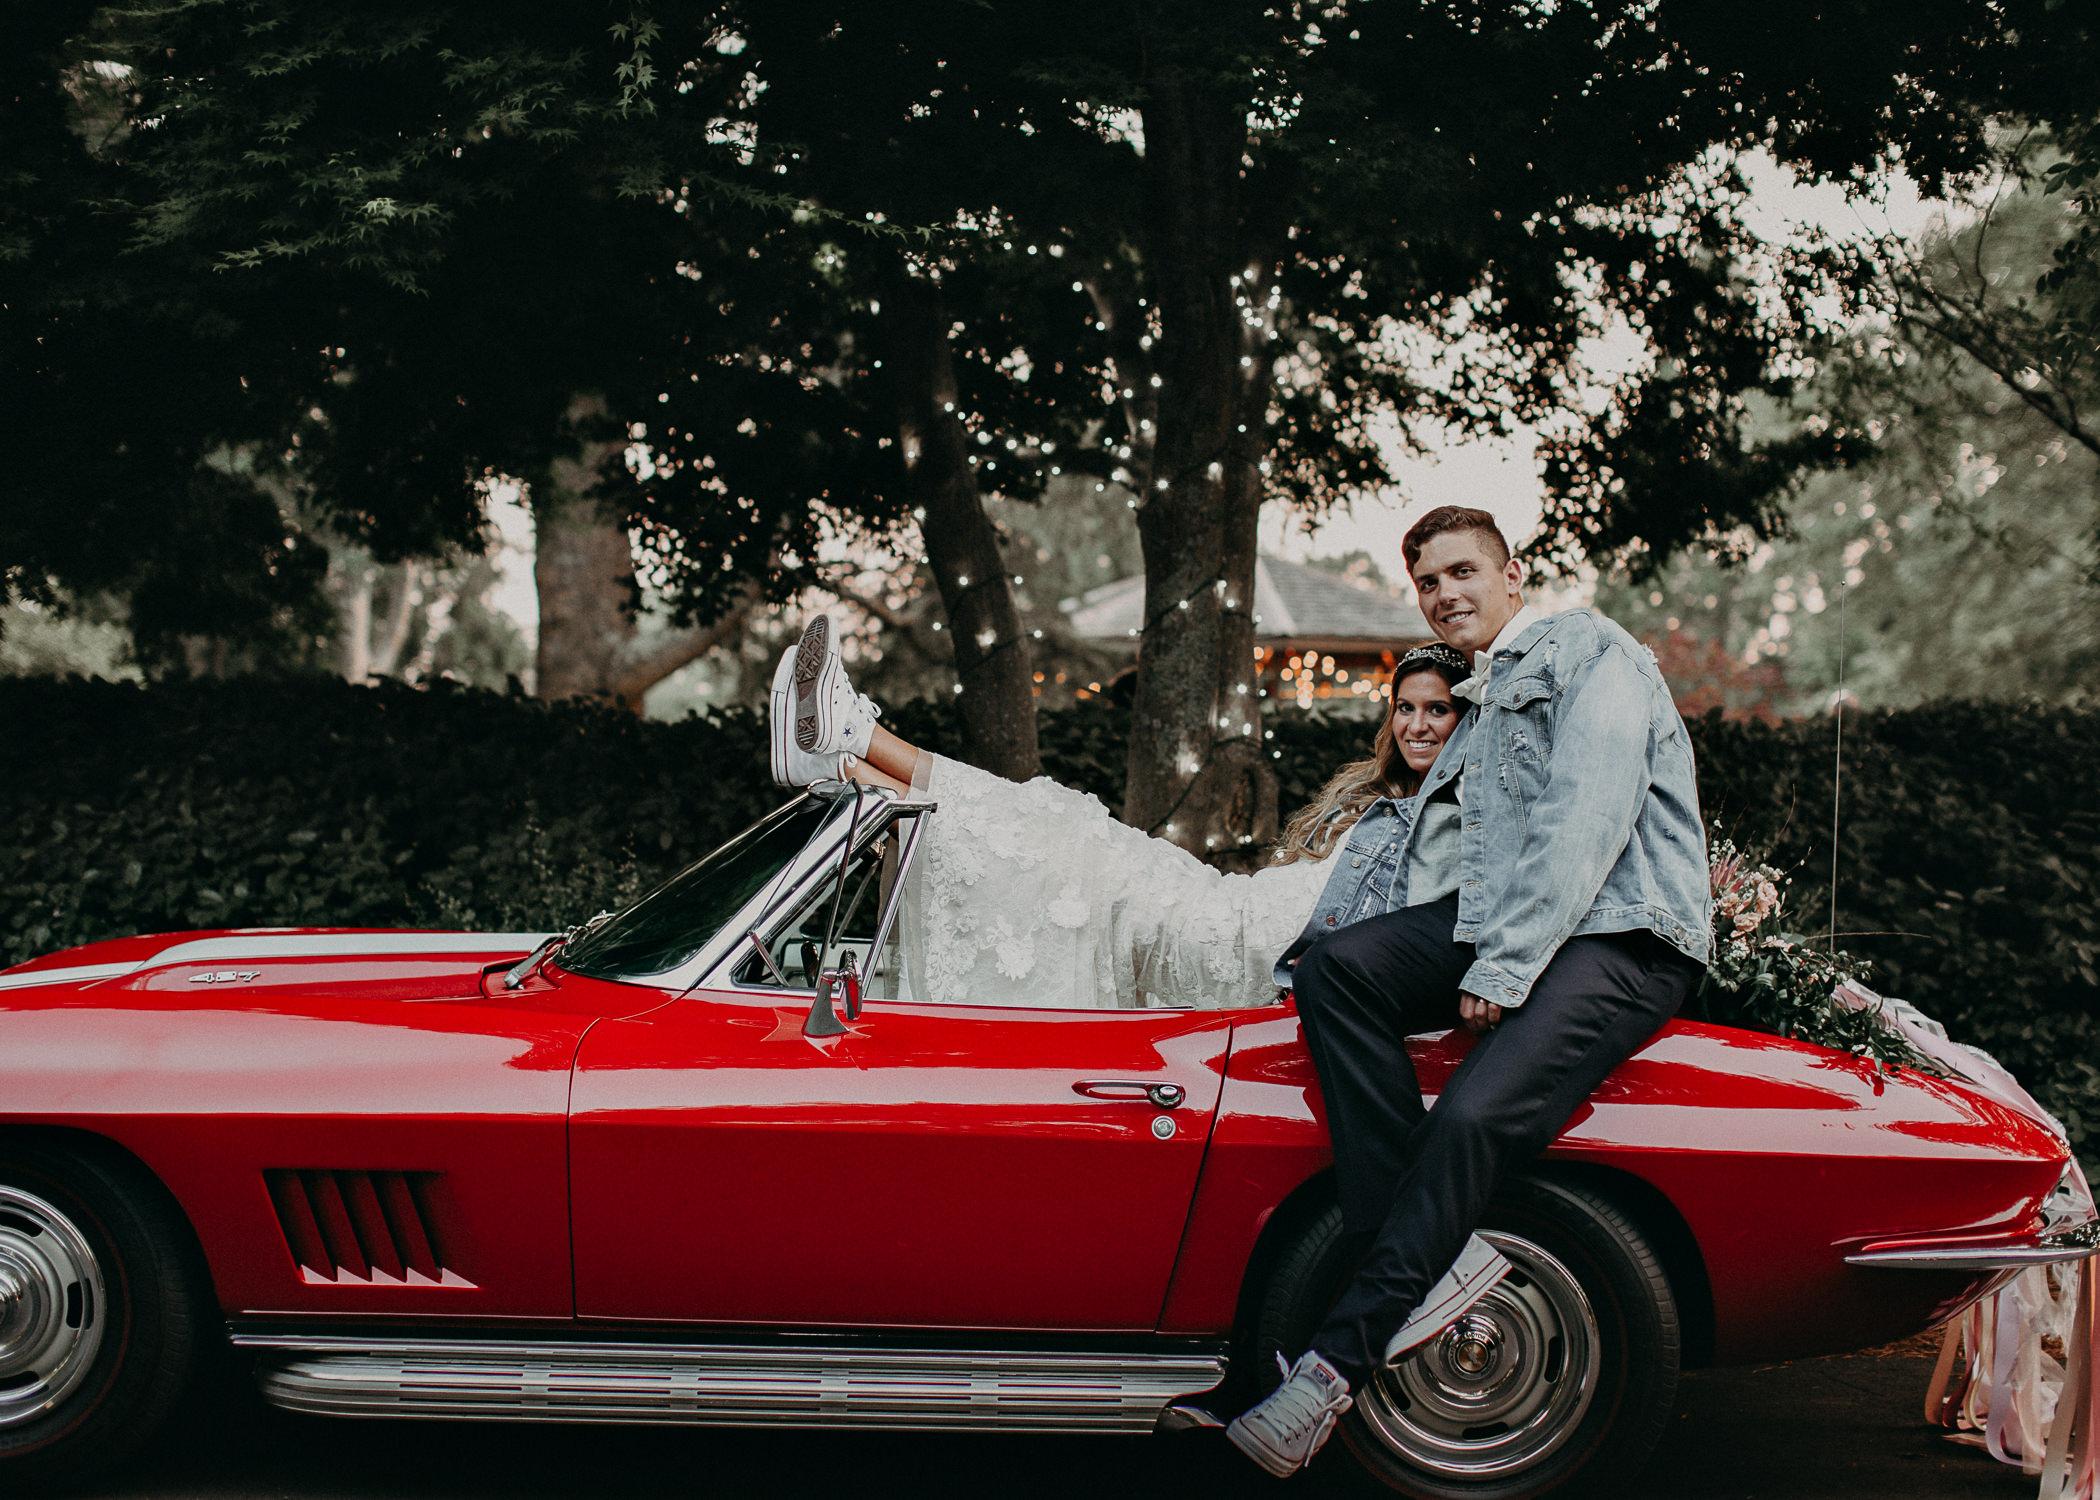 86Carl House Wedding Venue Ga, Atlanta Wedding Photographer - Boho, Bohemian, Junebug Weddings, Vintage, Retro, Trendy. Aline Marin Photography. .jpg